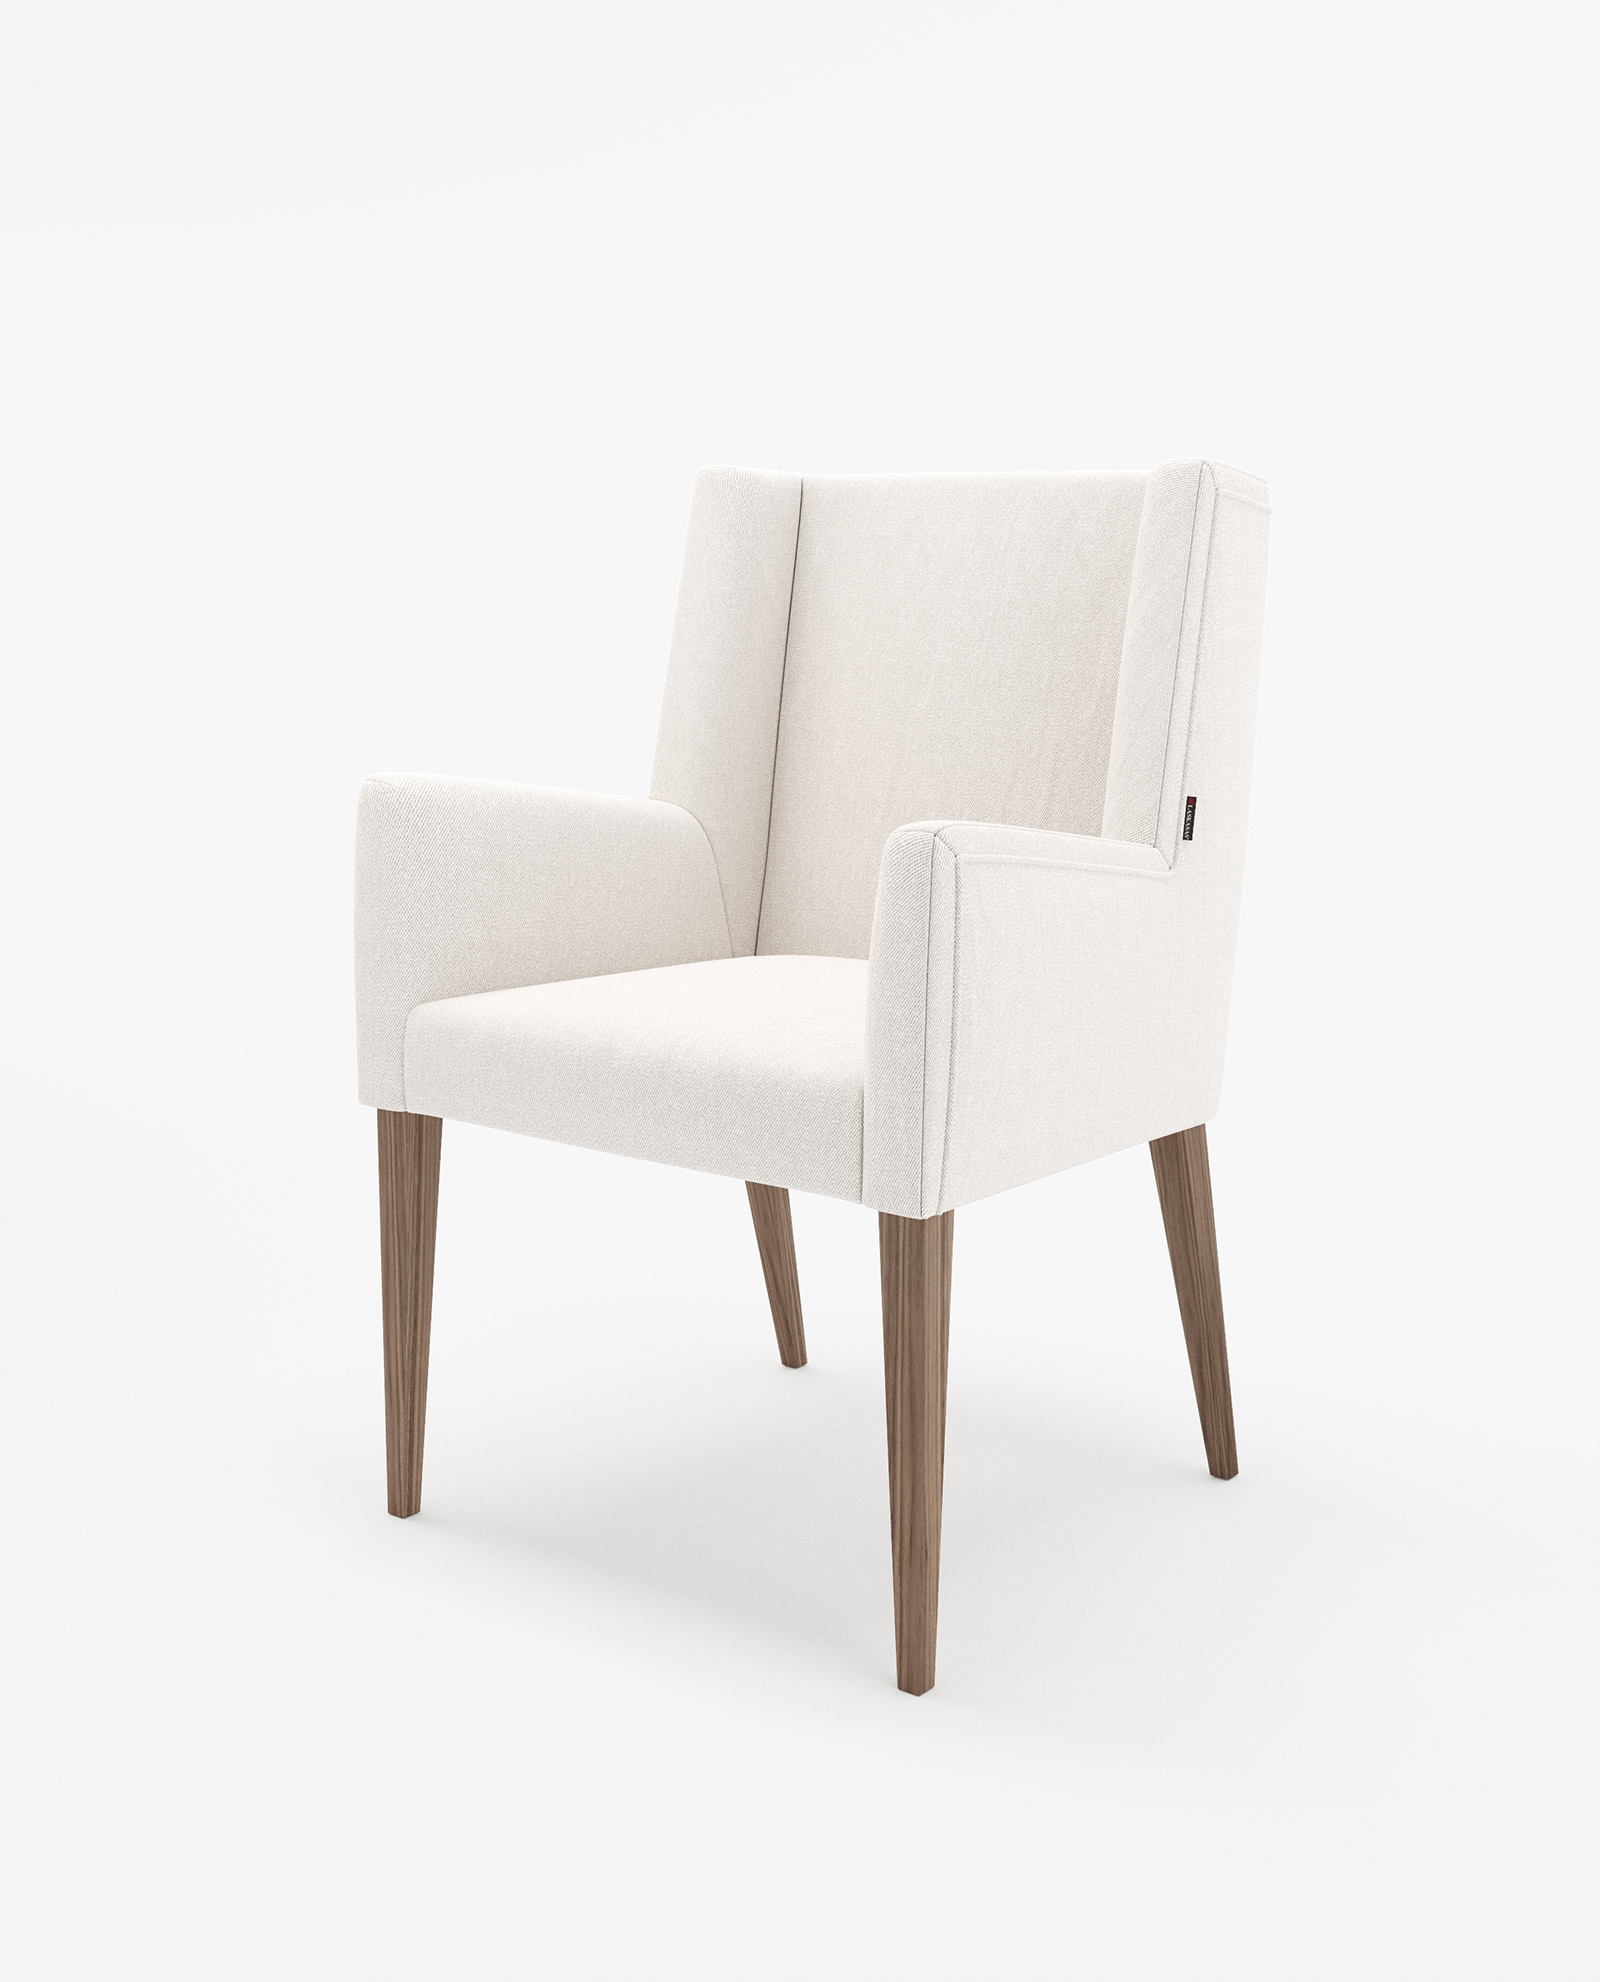 cadeira-bracos-perola-nogueira (1)